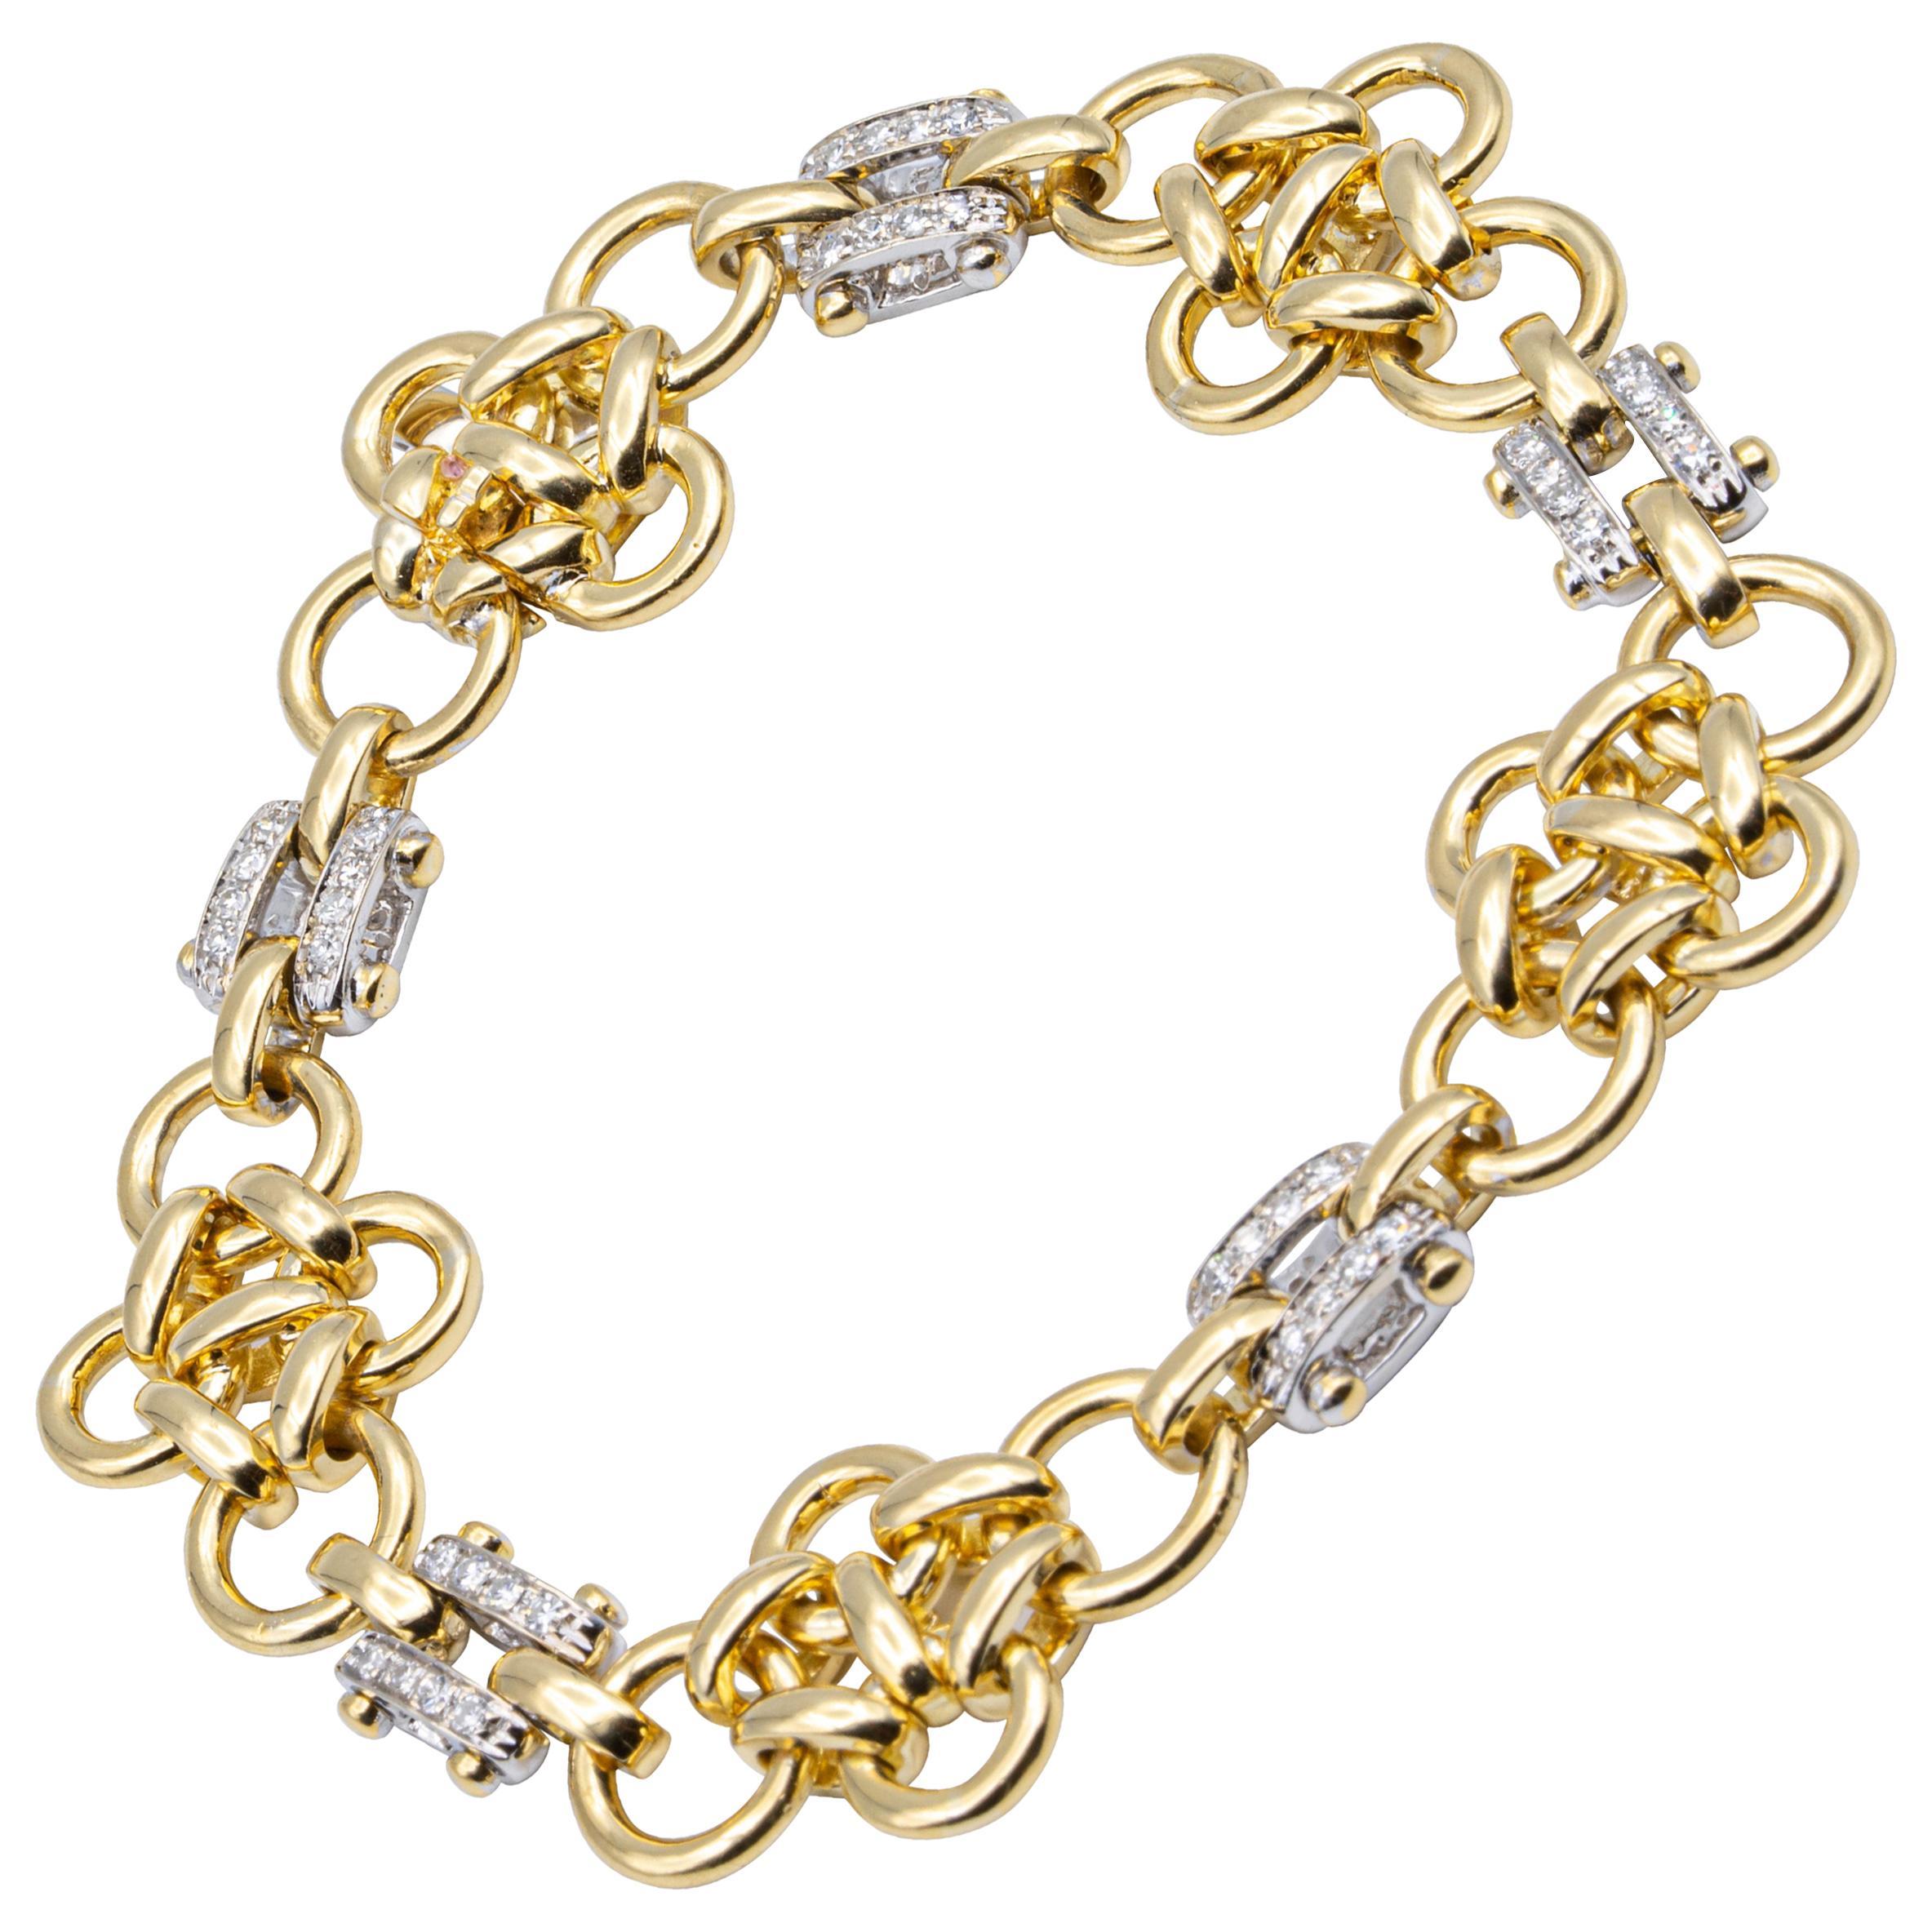 Tiffany & Co. Italy 18K Yellow Gold Heavyweight Link + Diamond Bracelet Orig Box